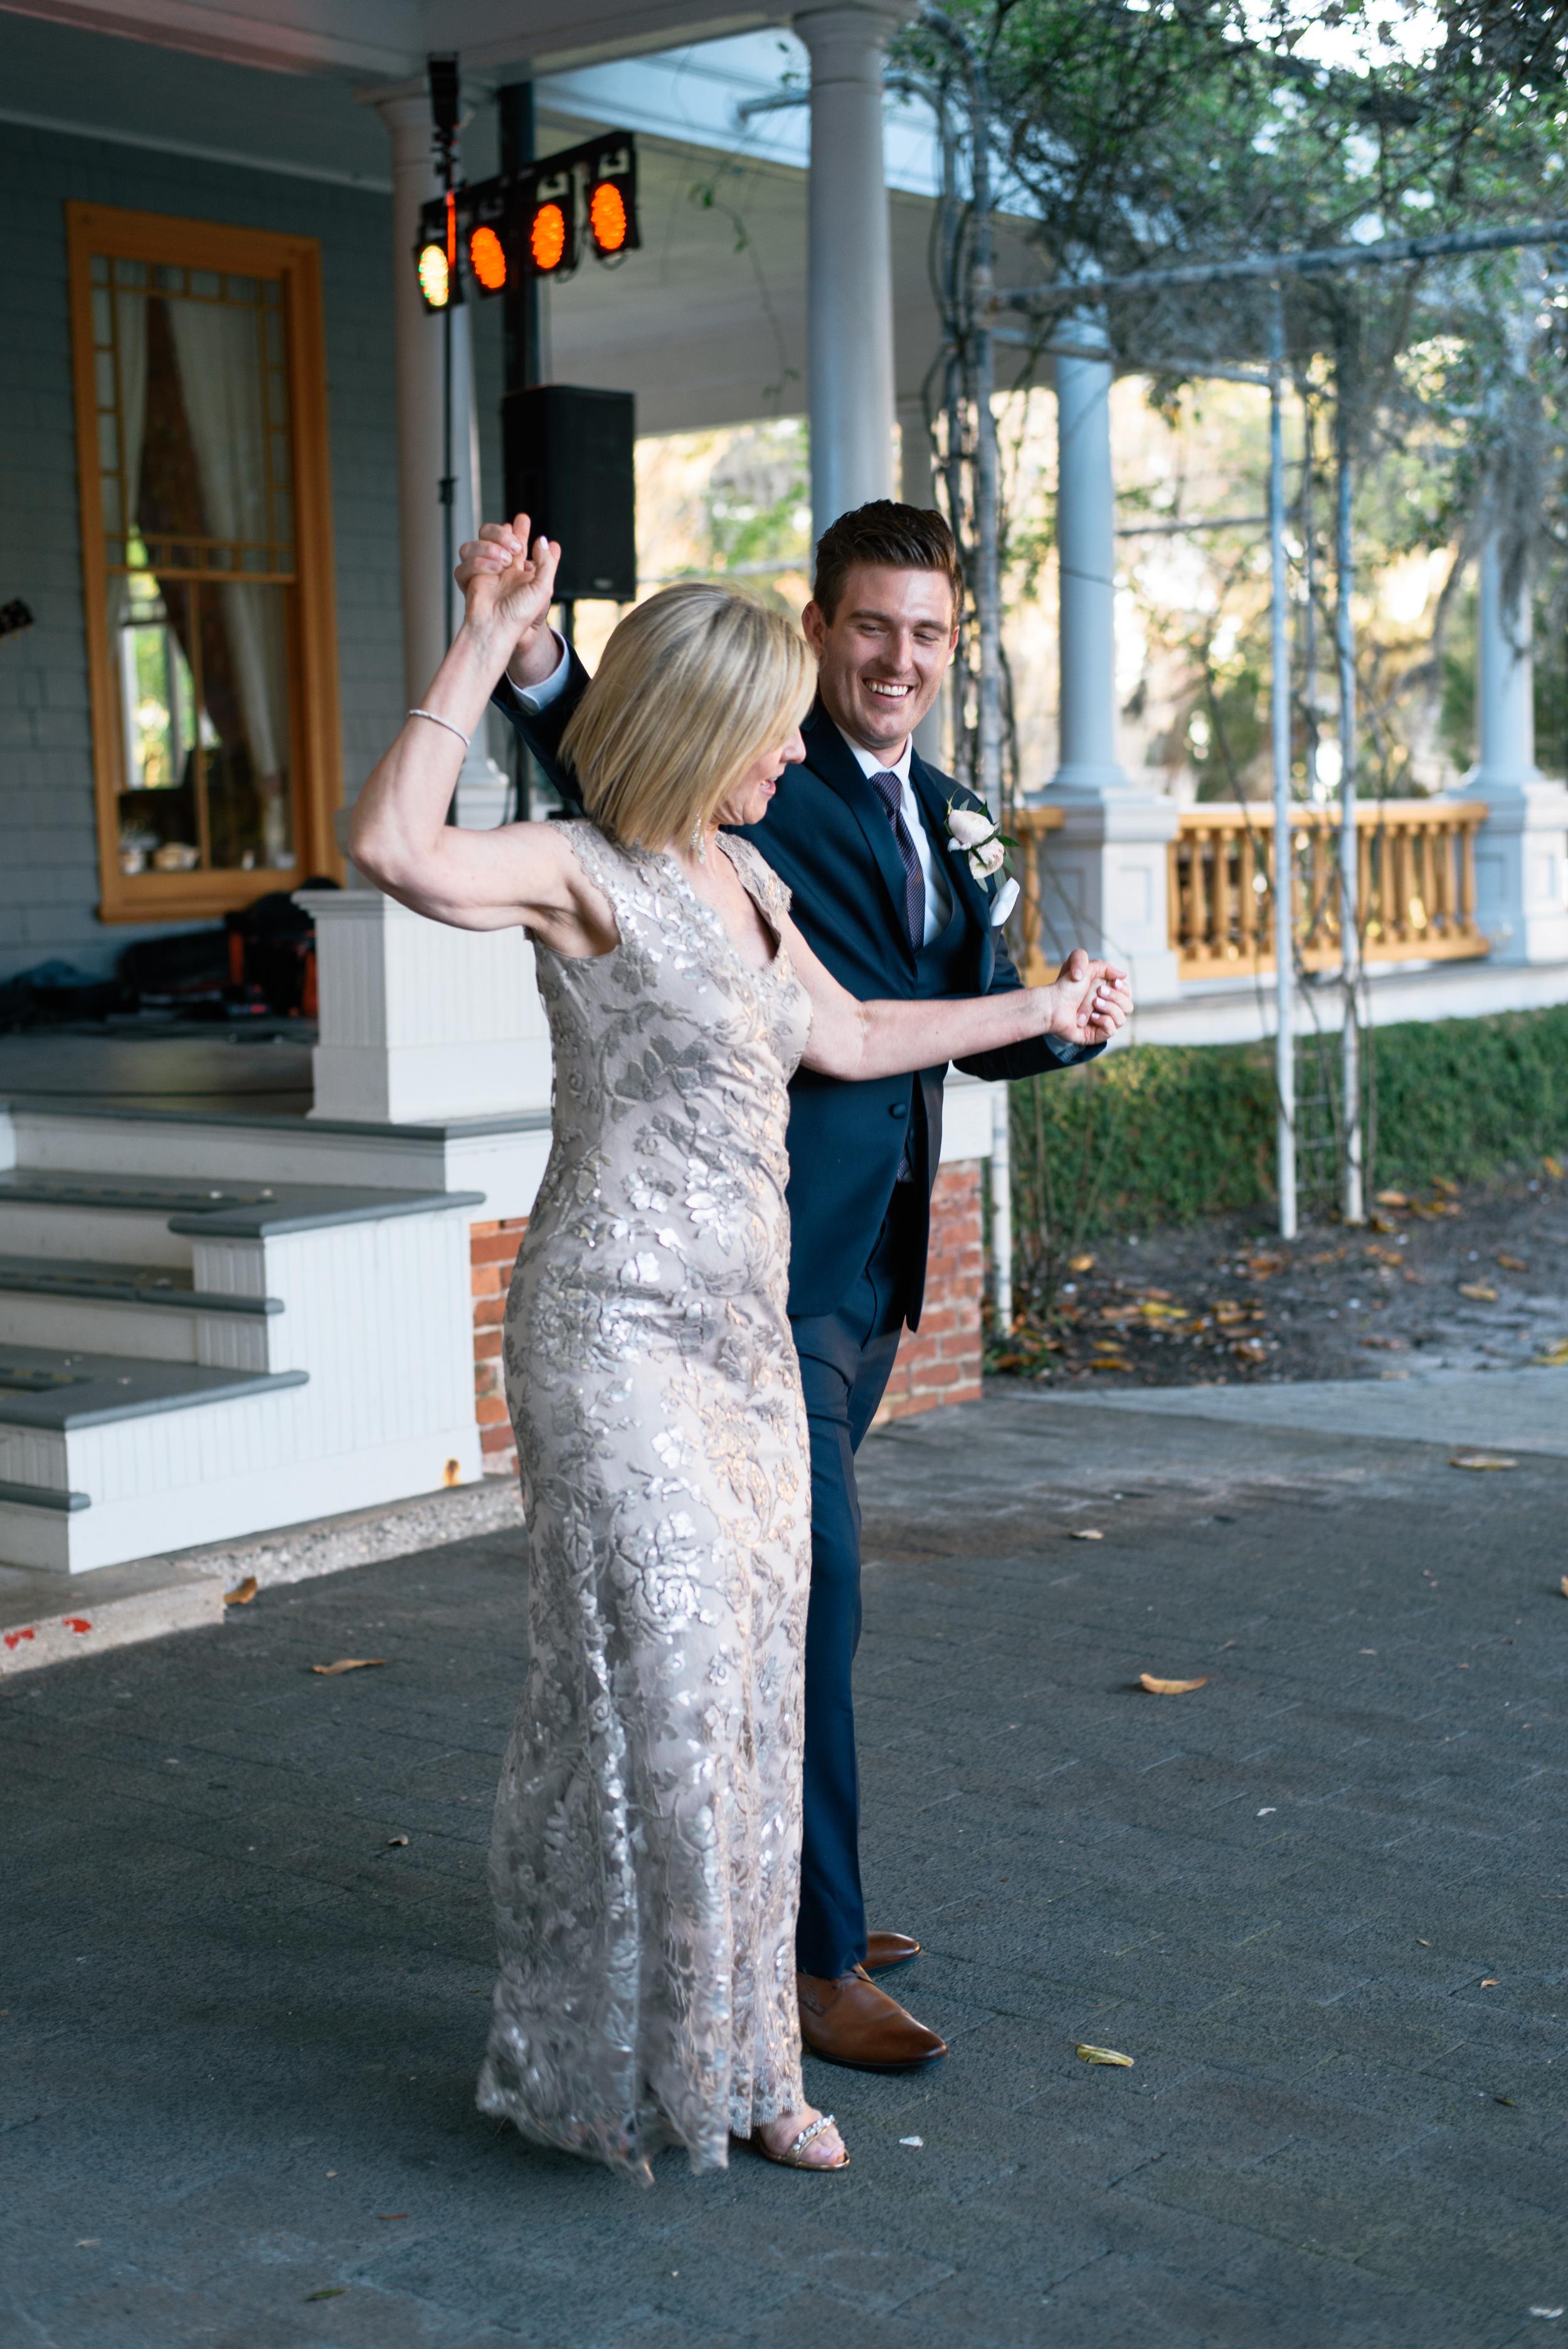 kadi-and-matt-carroll-april-9-2016-jekyl-island-wedding-m-newsom-photography- (342 of 484).jpg